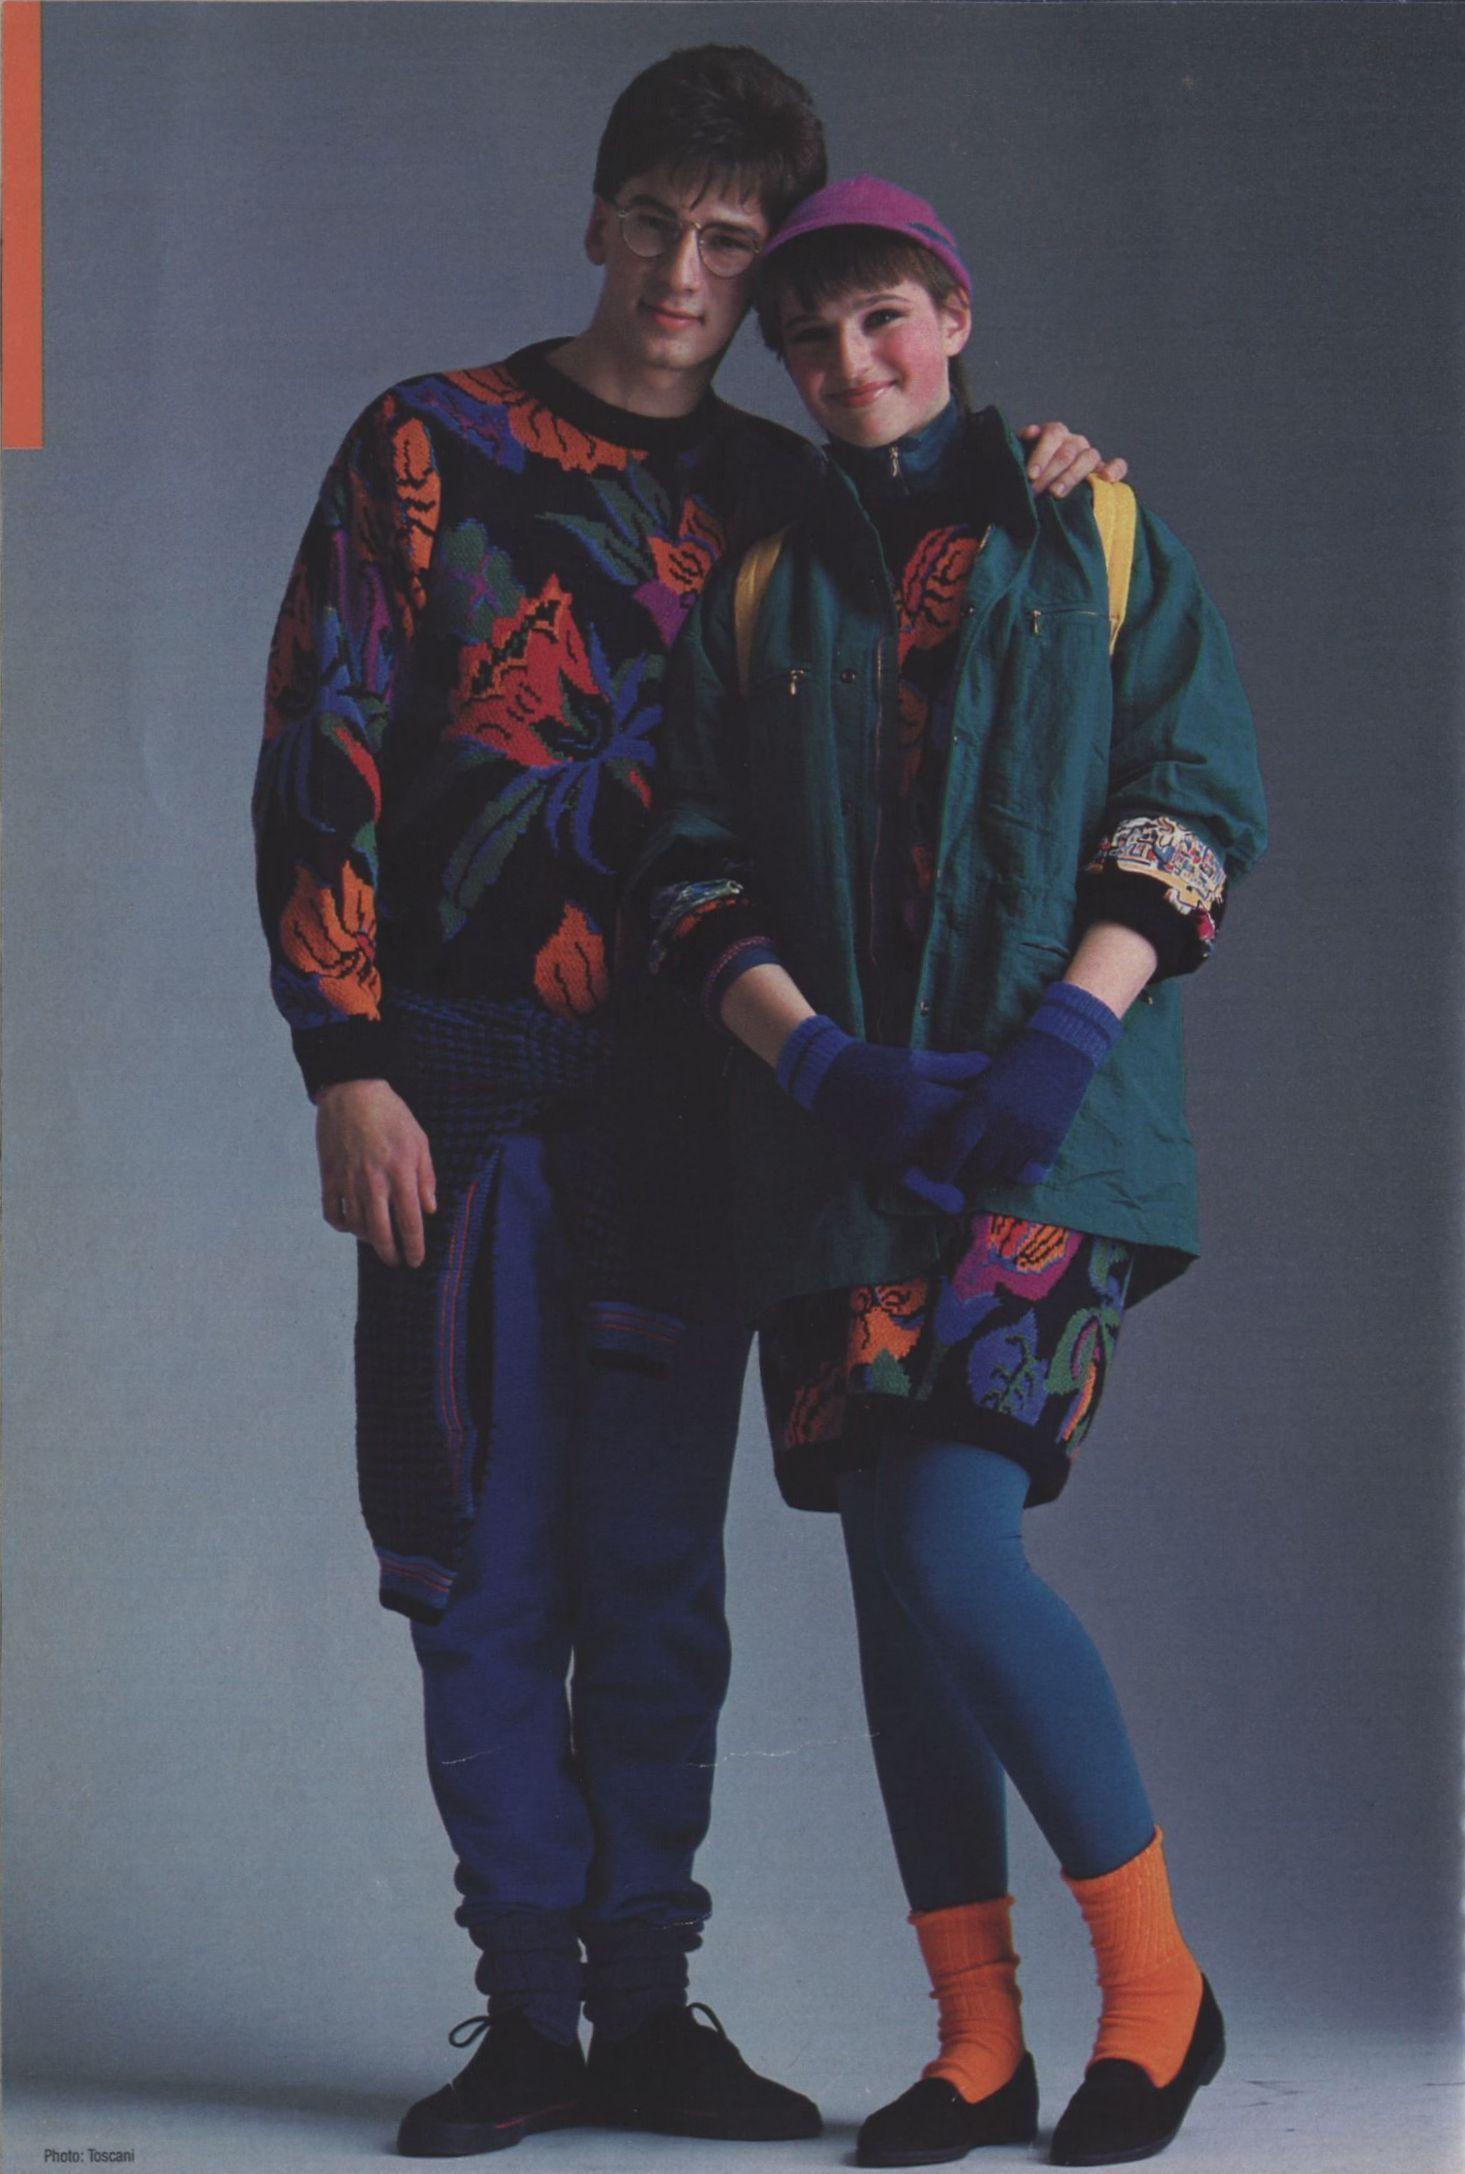 Vintage 80s Fashion Photos: 1980s Ads - Esprit, Benetton & Swatch